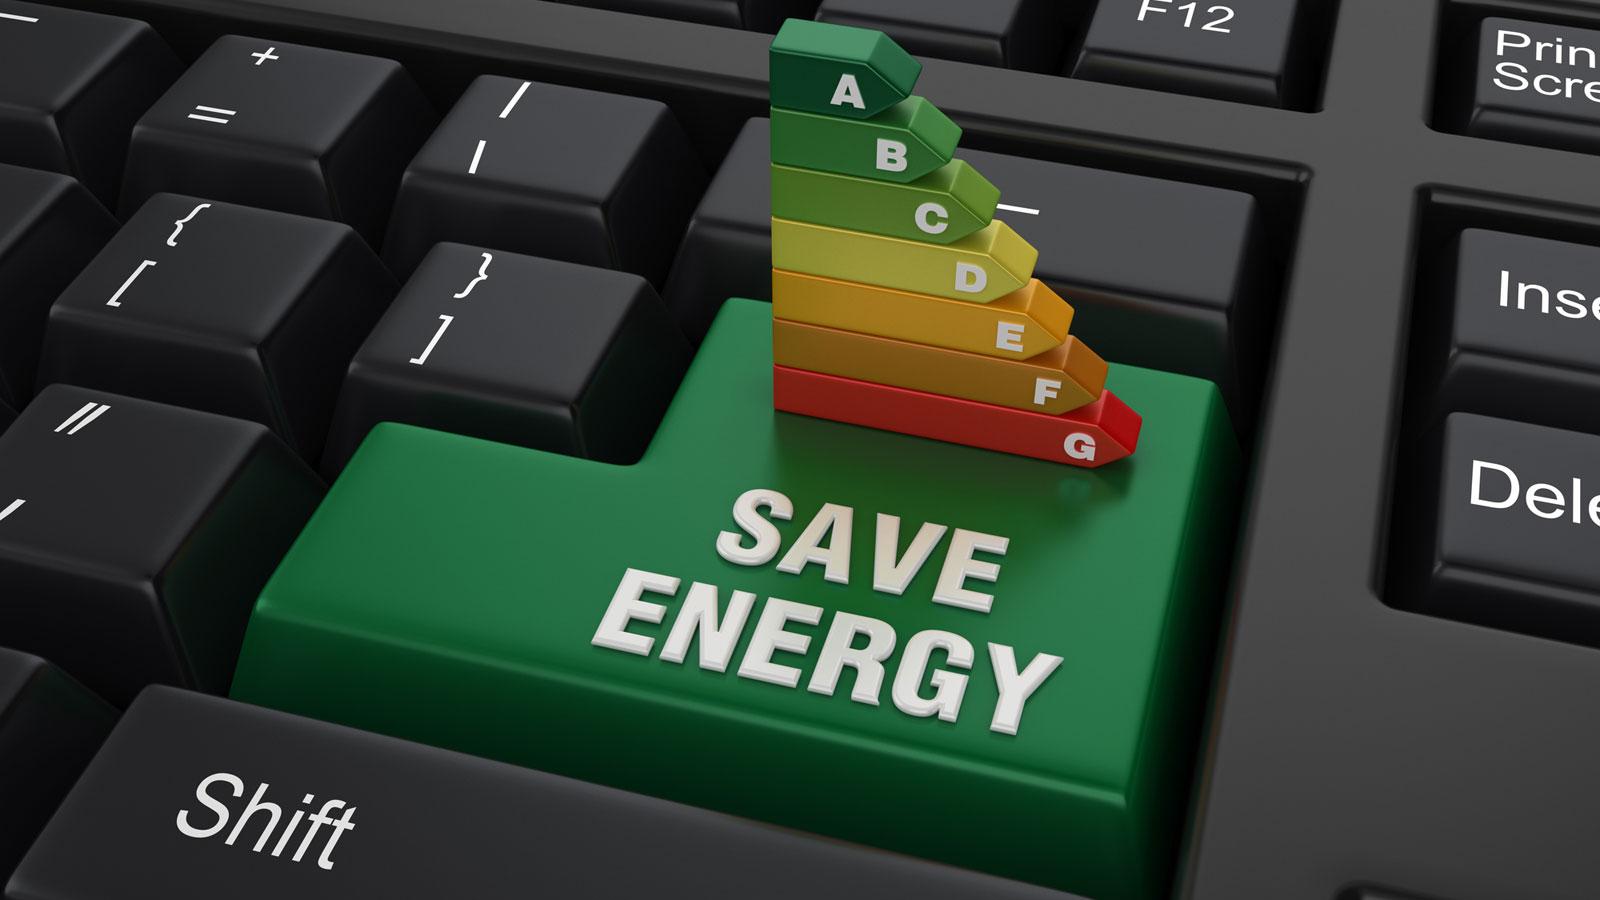 Energiesparmodus Windows 10